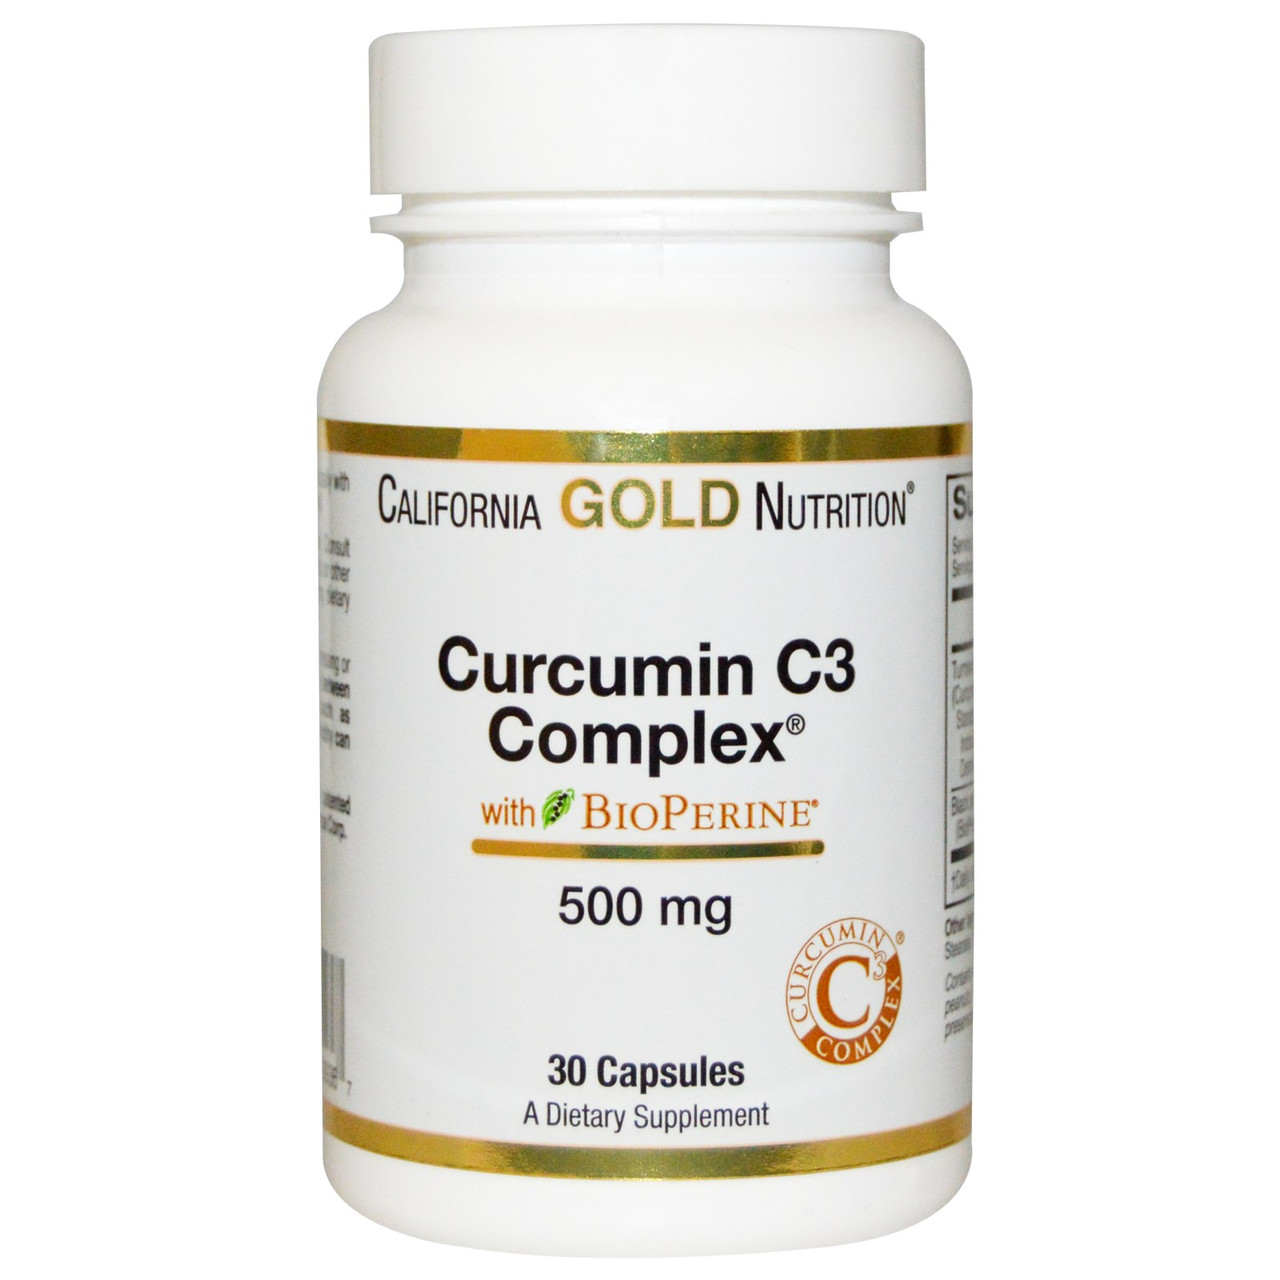 Curcumin C3 Complex 500 mg California Gold Nutrition 30 VCaps